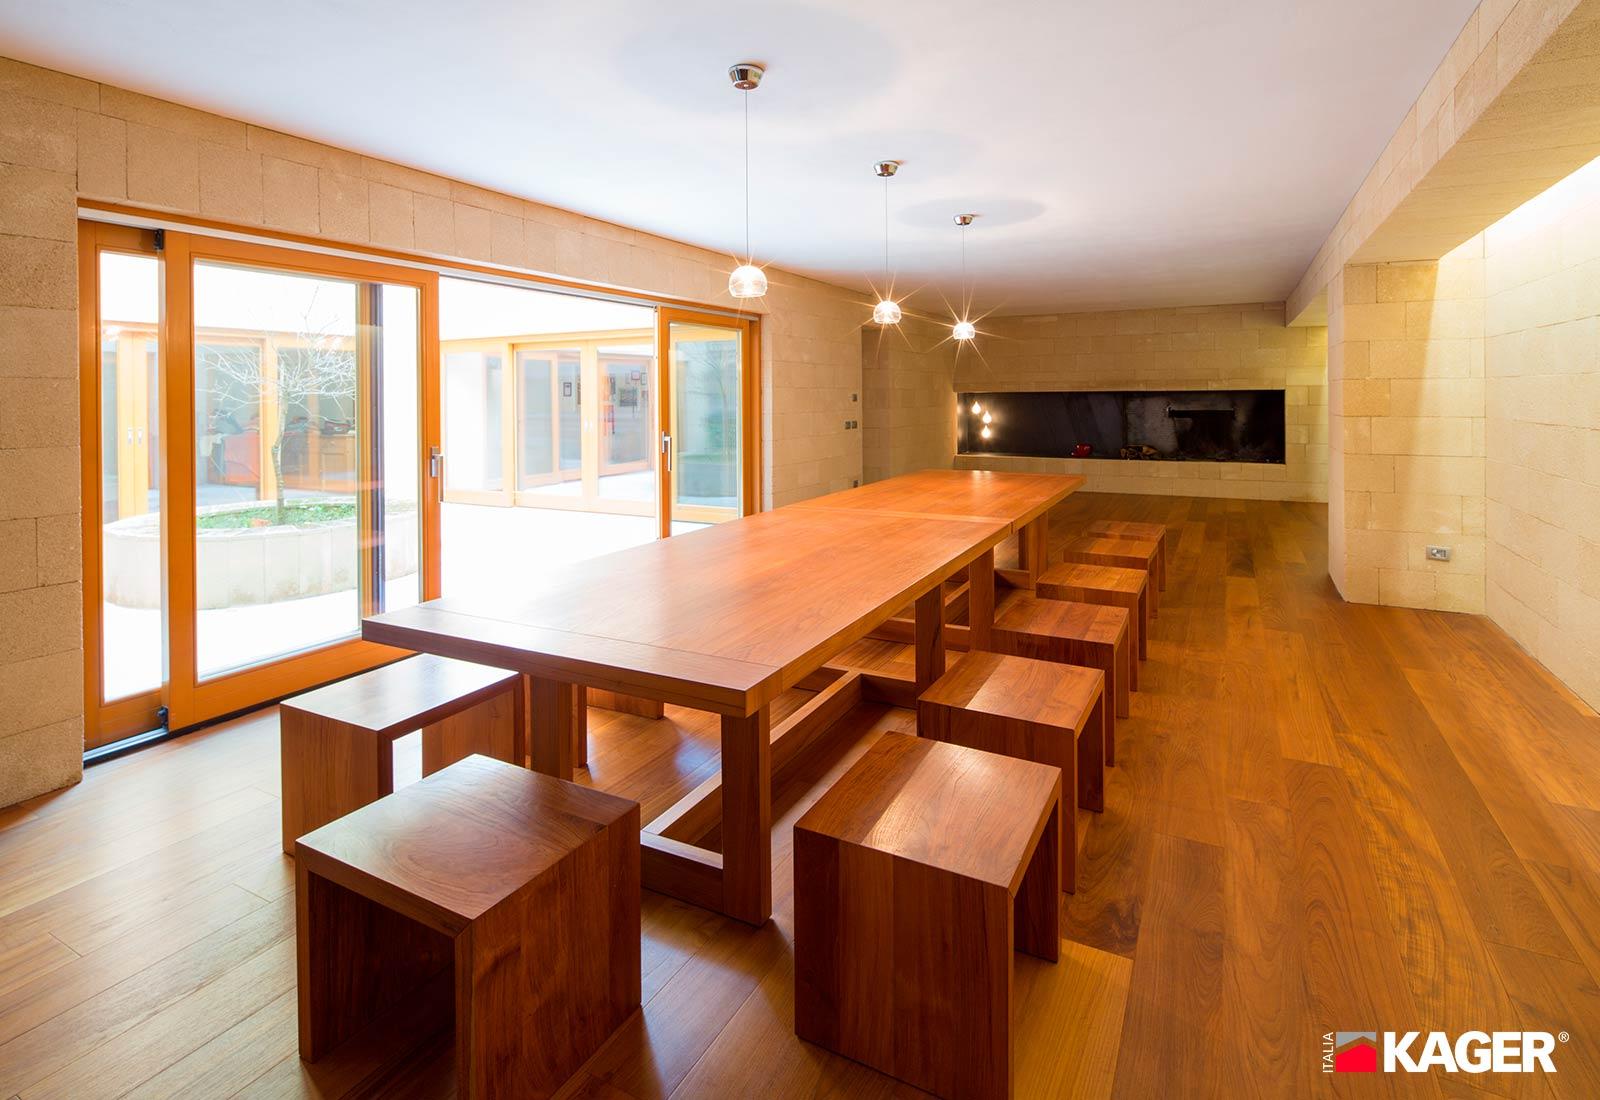 Casa-in-legno-Forli-Kager-Italia-10